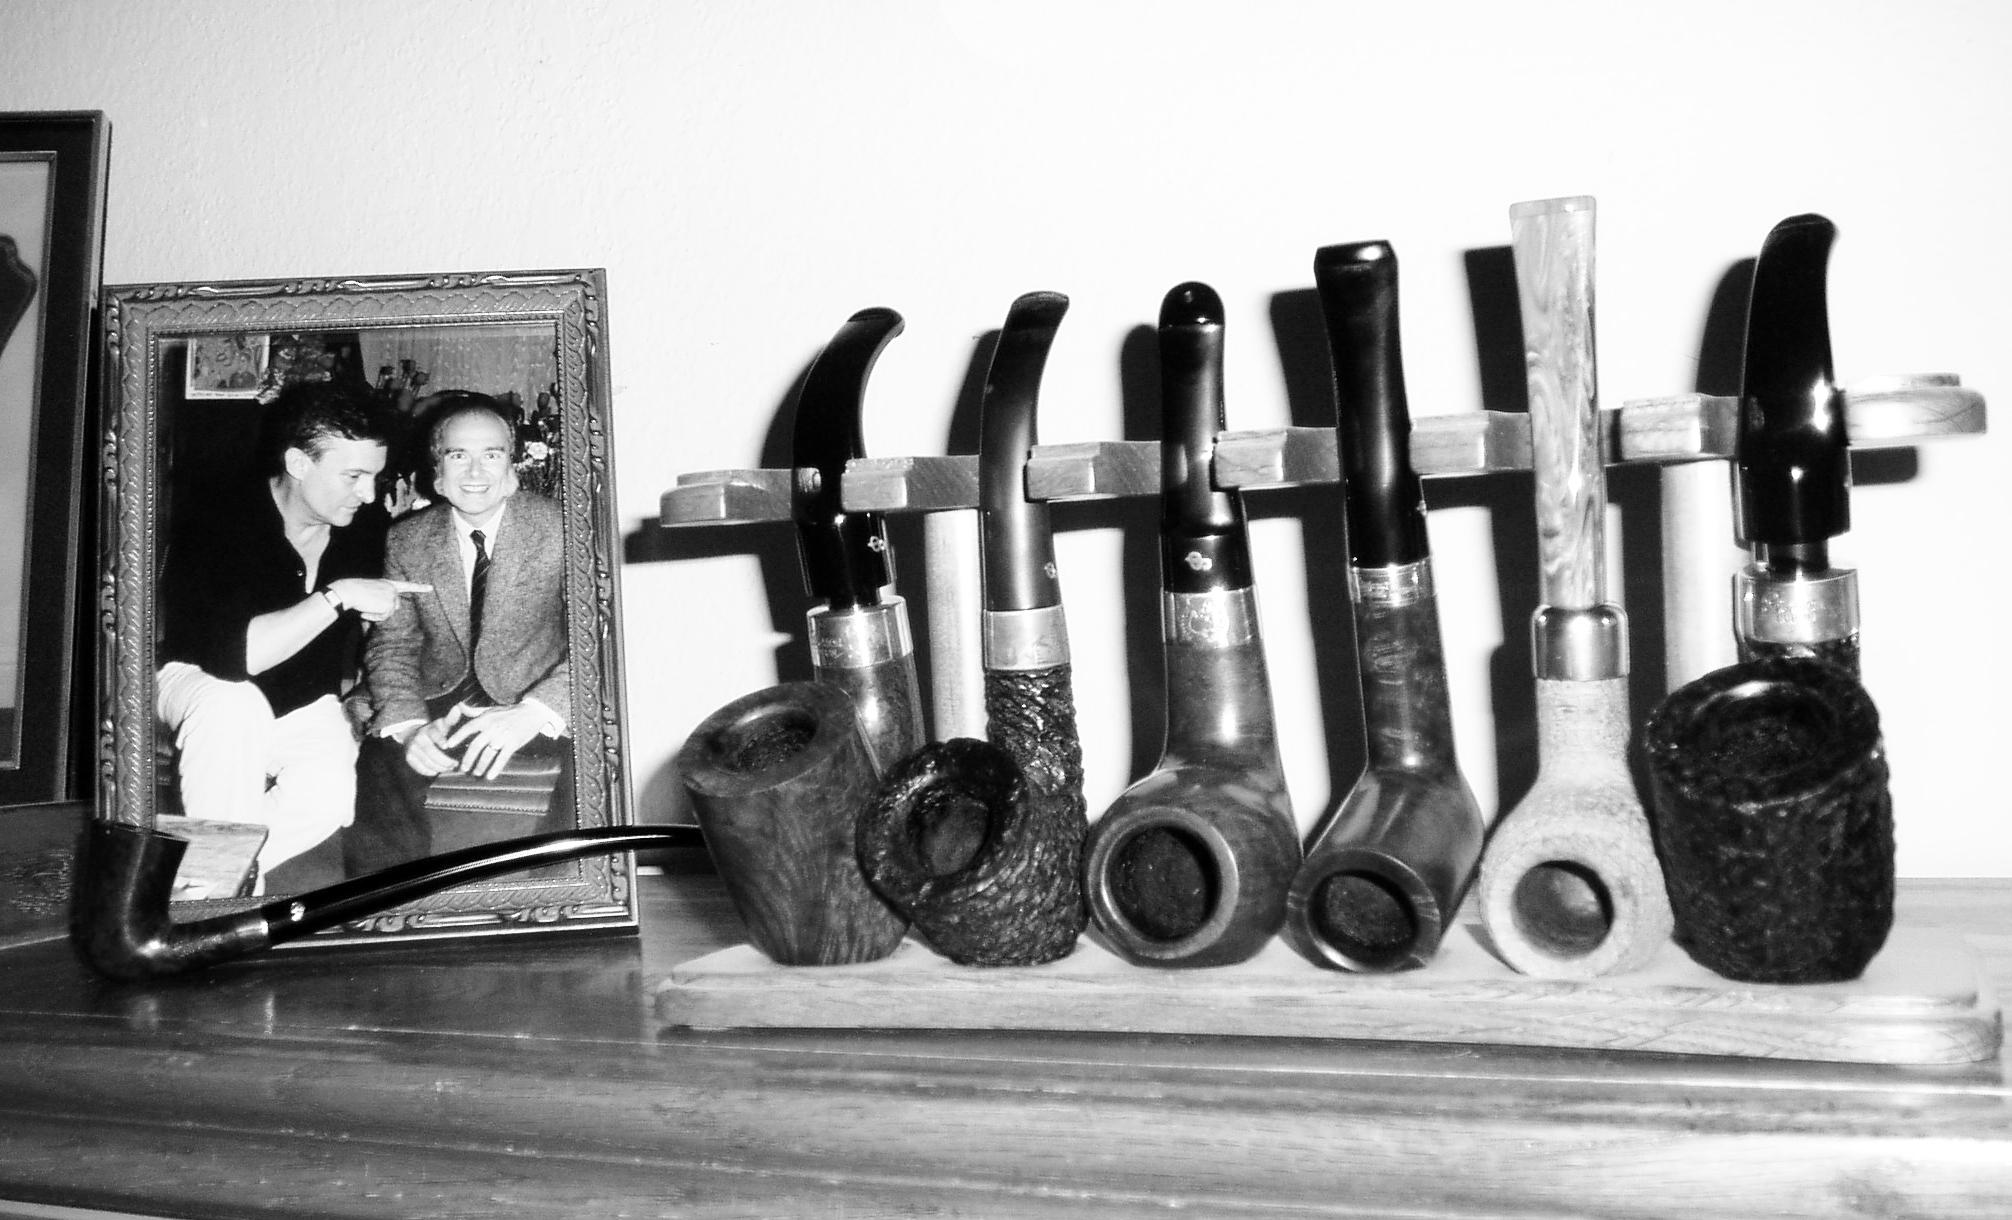 249. R. Dixon Smith: Sherlockian, Cinéaste, Bluegrass Musician & Peterson Lover